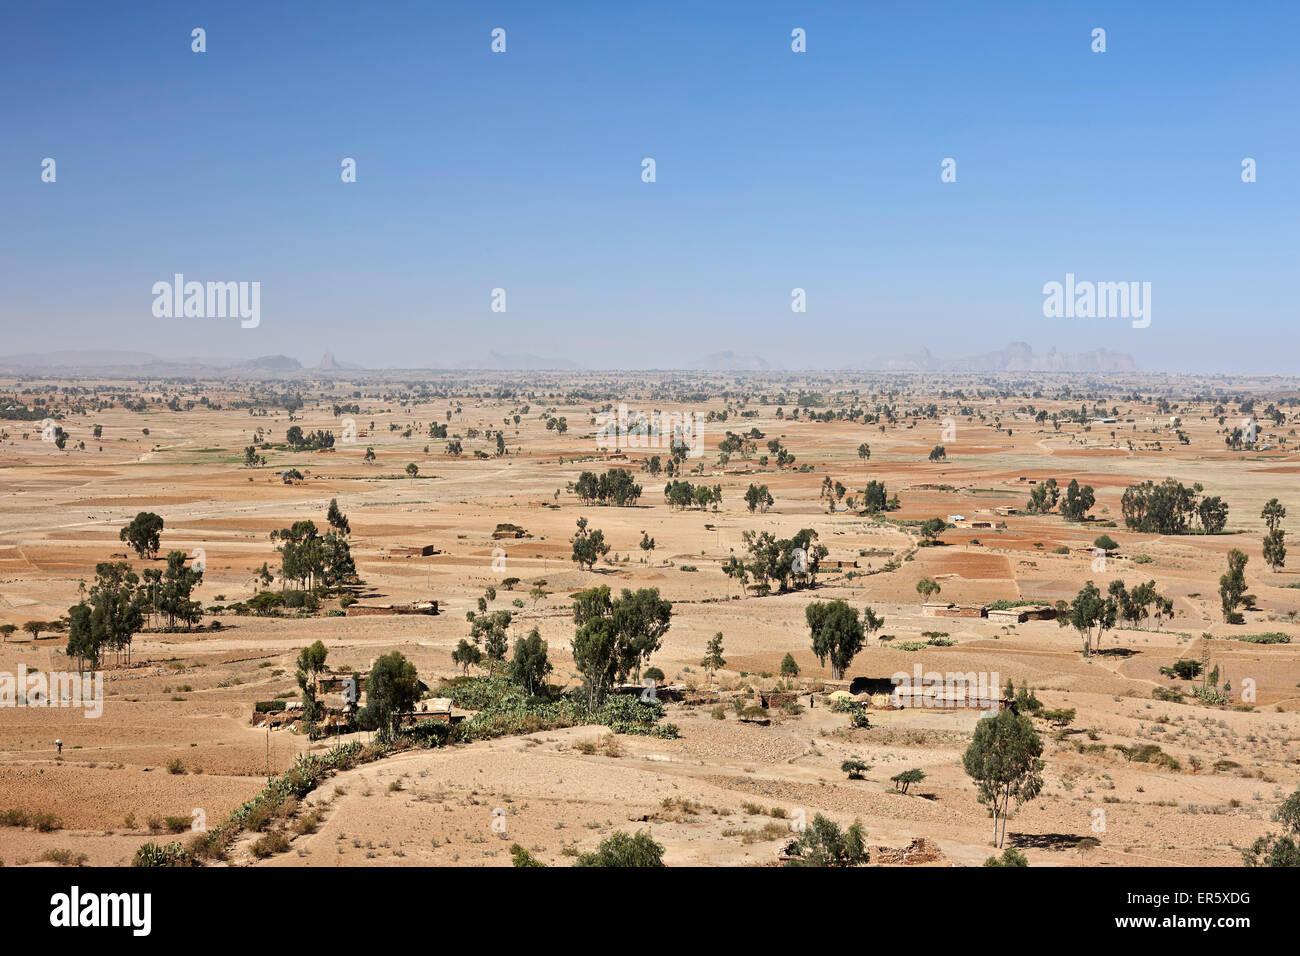 Fields and farmer huts, Gheralta mountains in background, Feraywi, Tigray region, Ethiopia - Stock Image